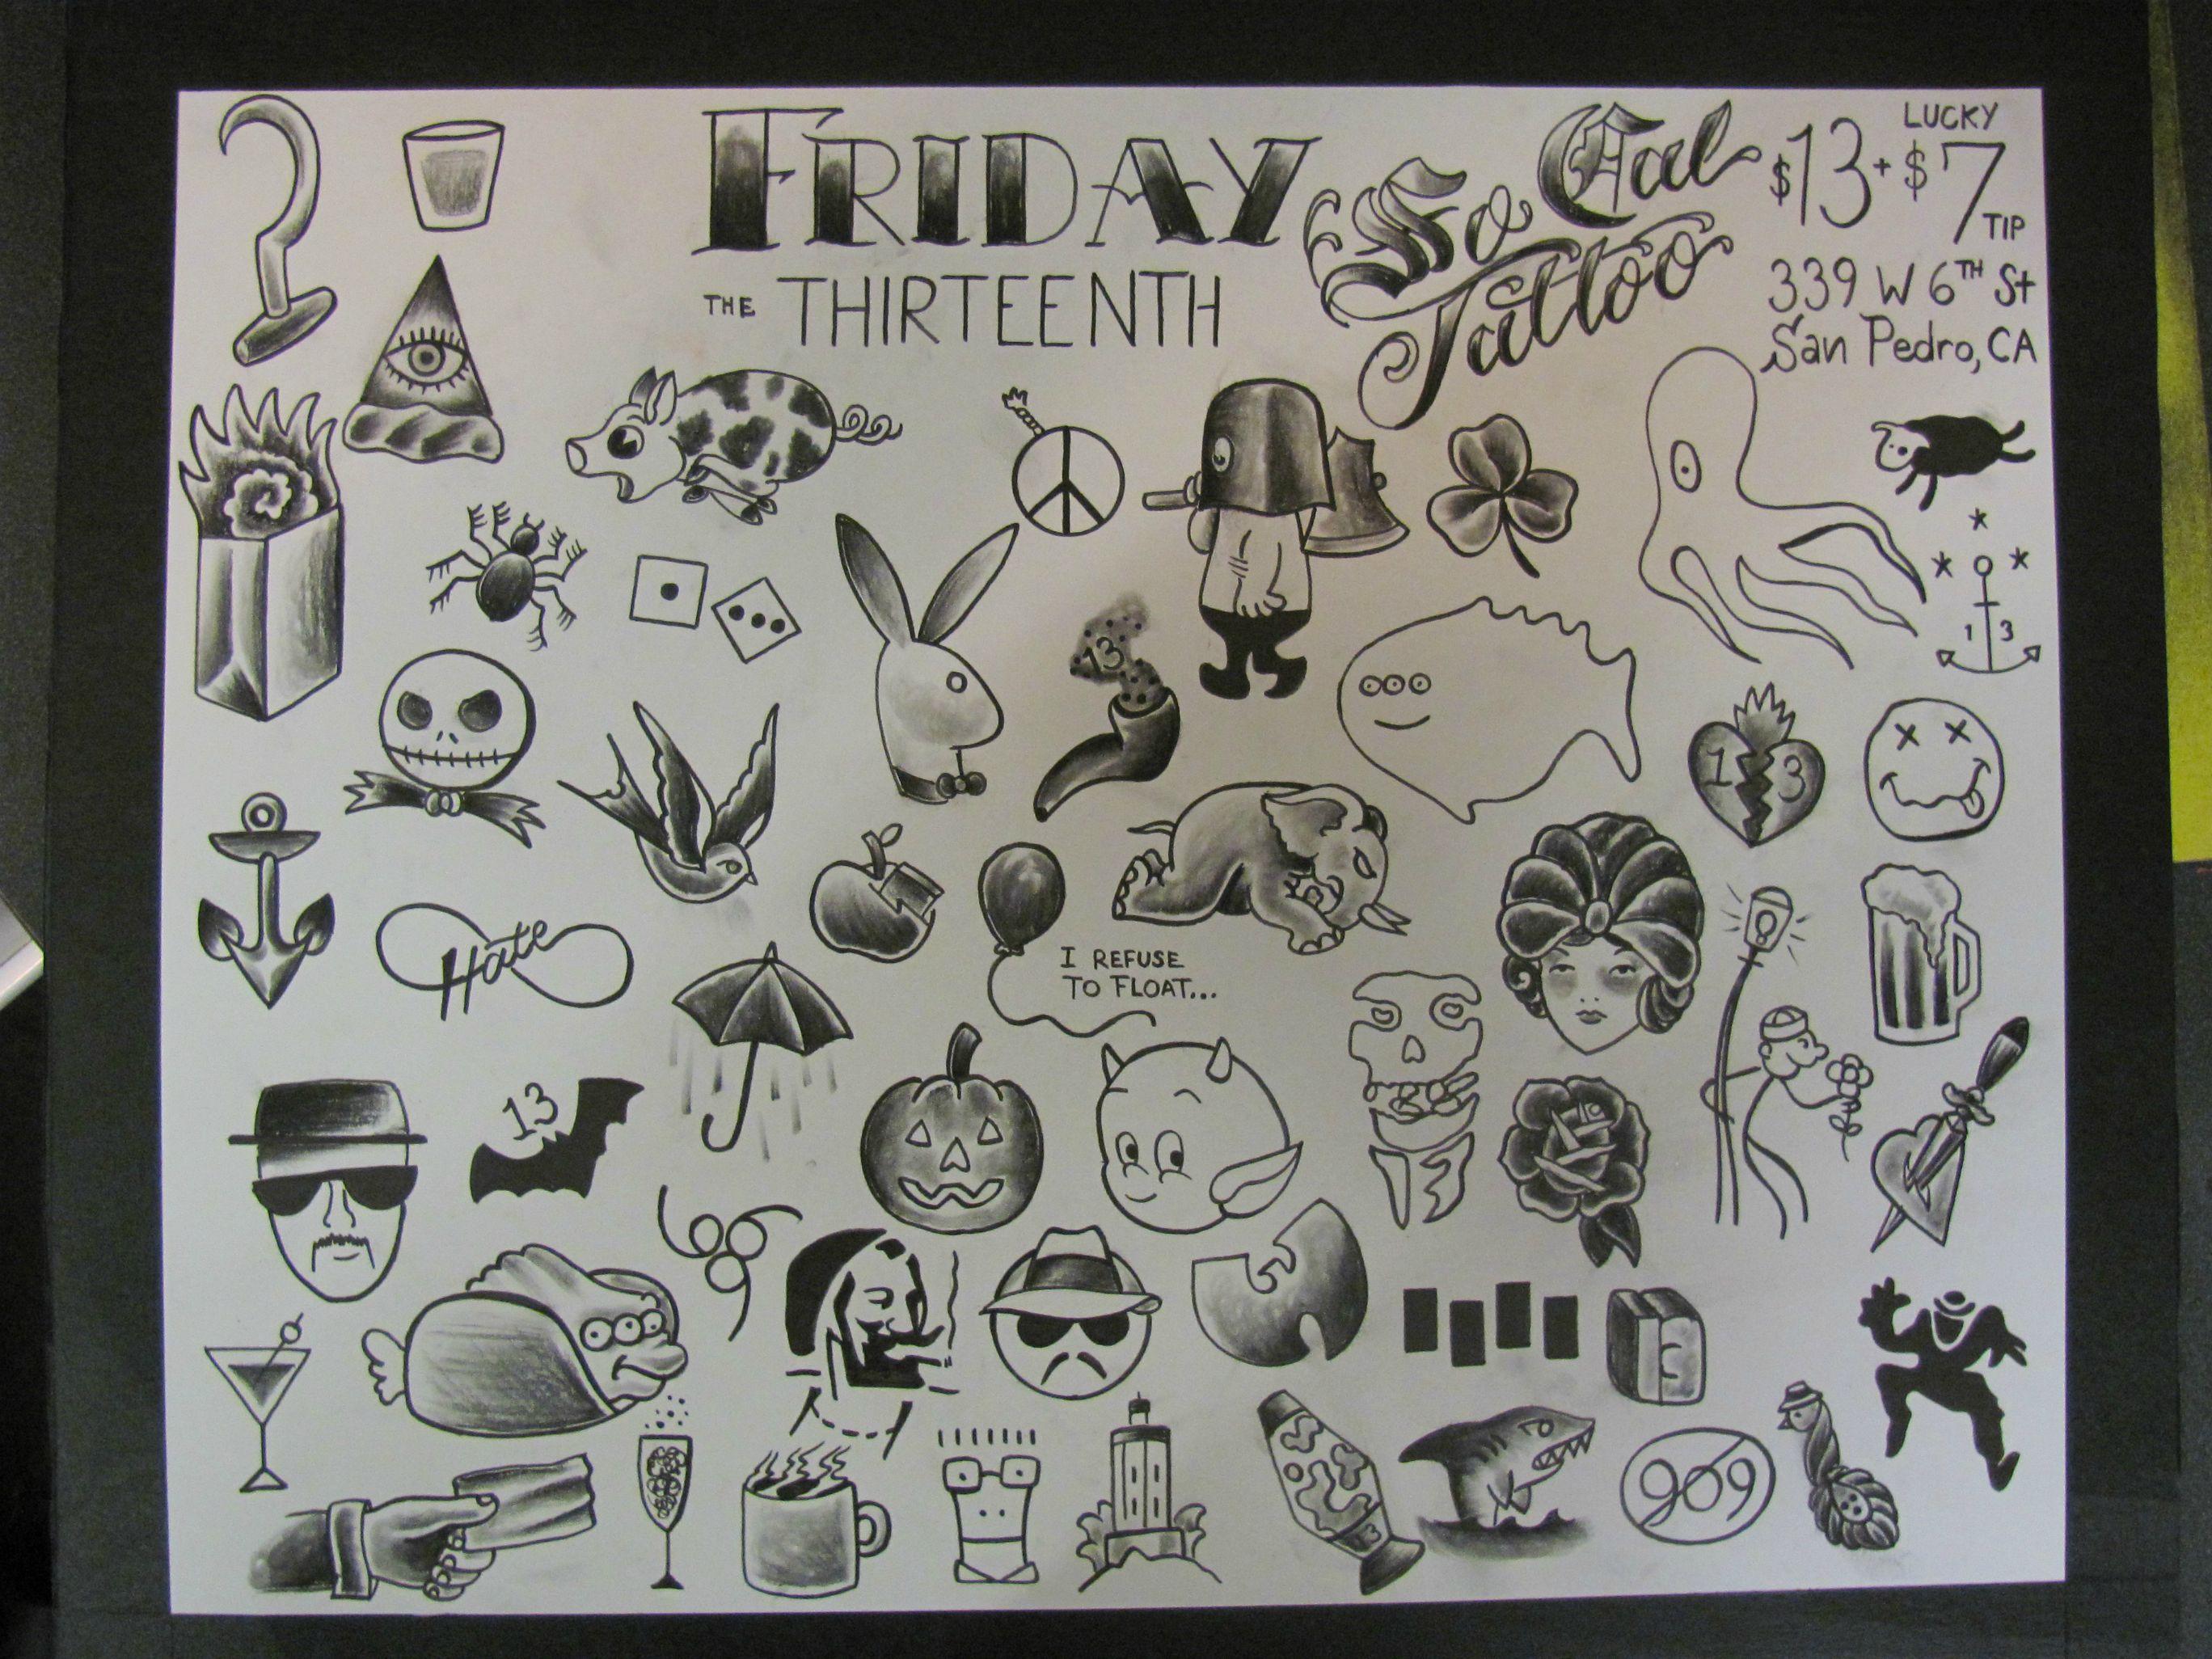 Friday 13th Flash Socal Tattoo San Pedro Ca Friday The 13th